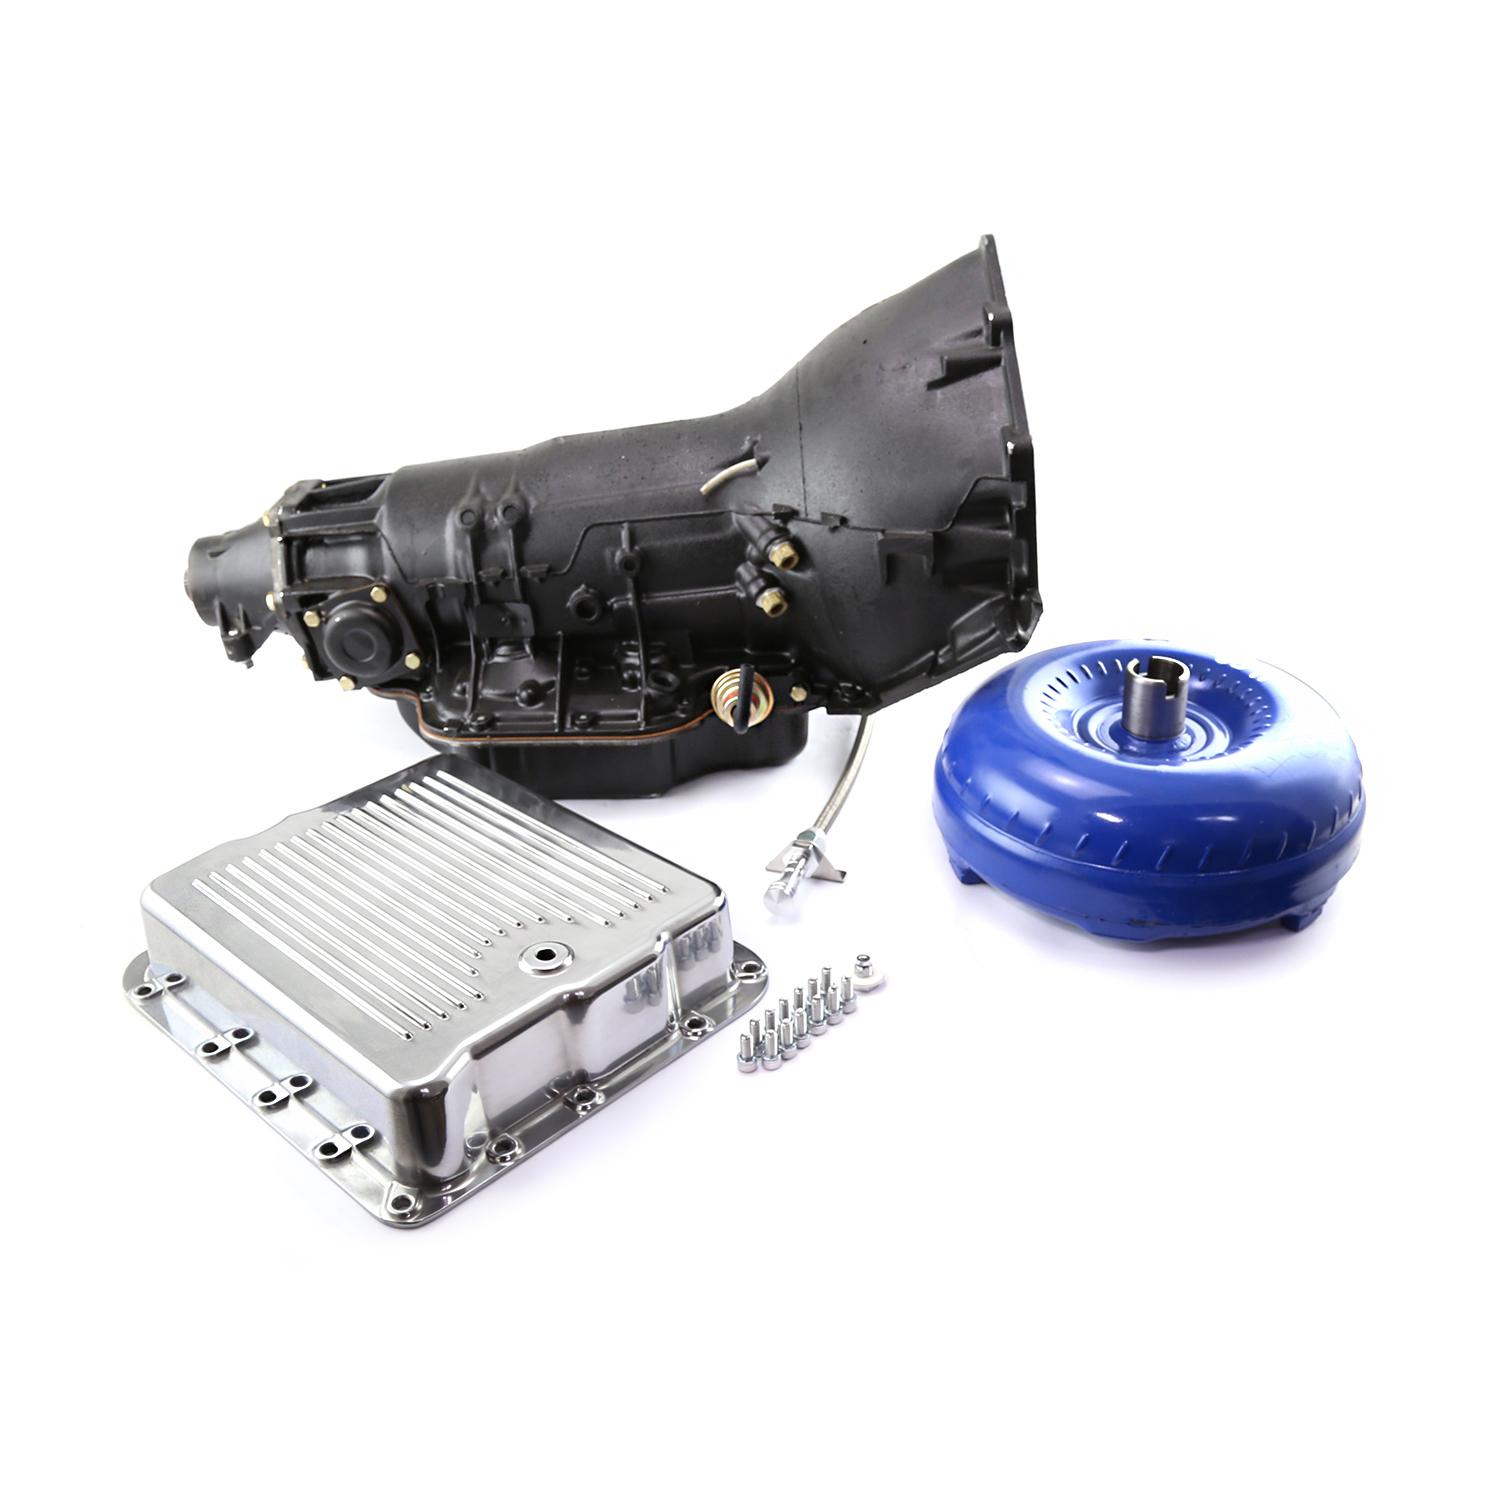 Turbo 700R-4 Chevy Performance Transmission Kit w/ 2800-3200 Stall Converter